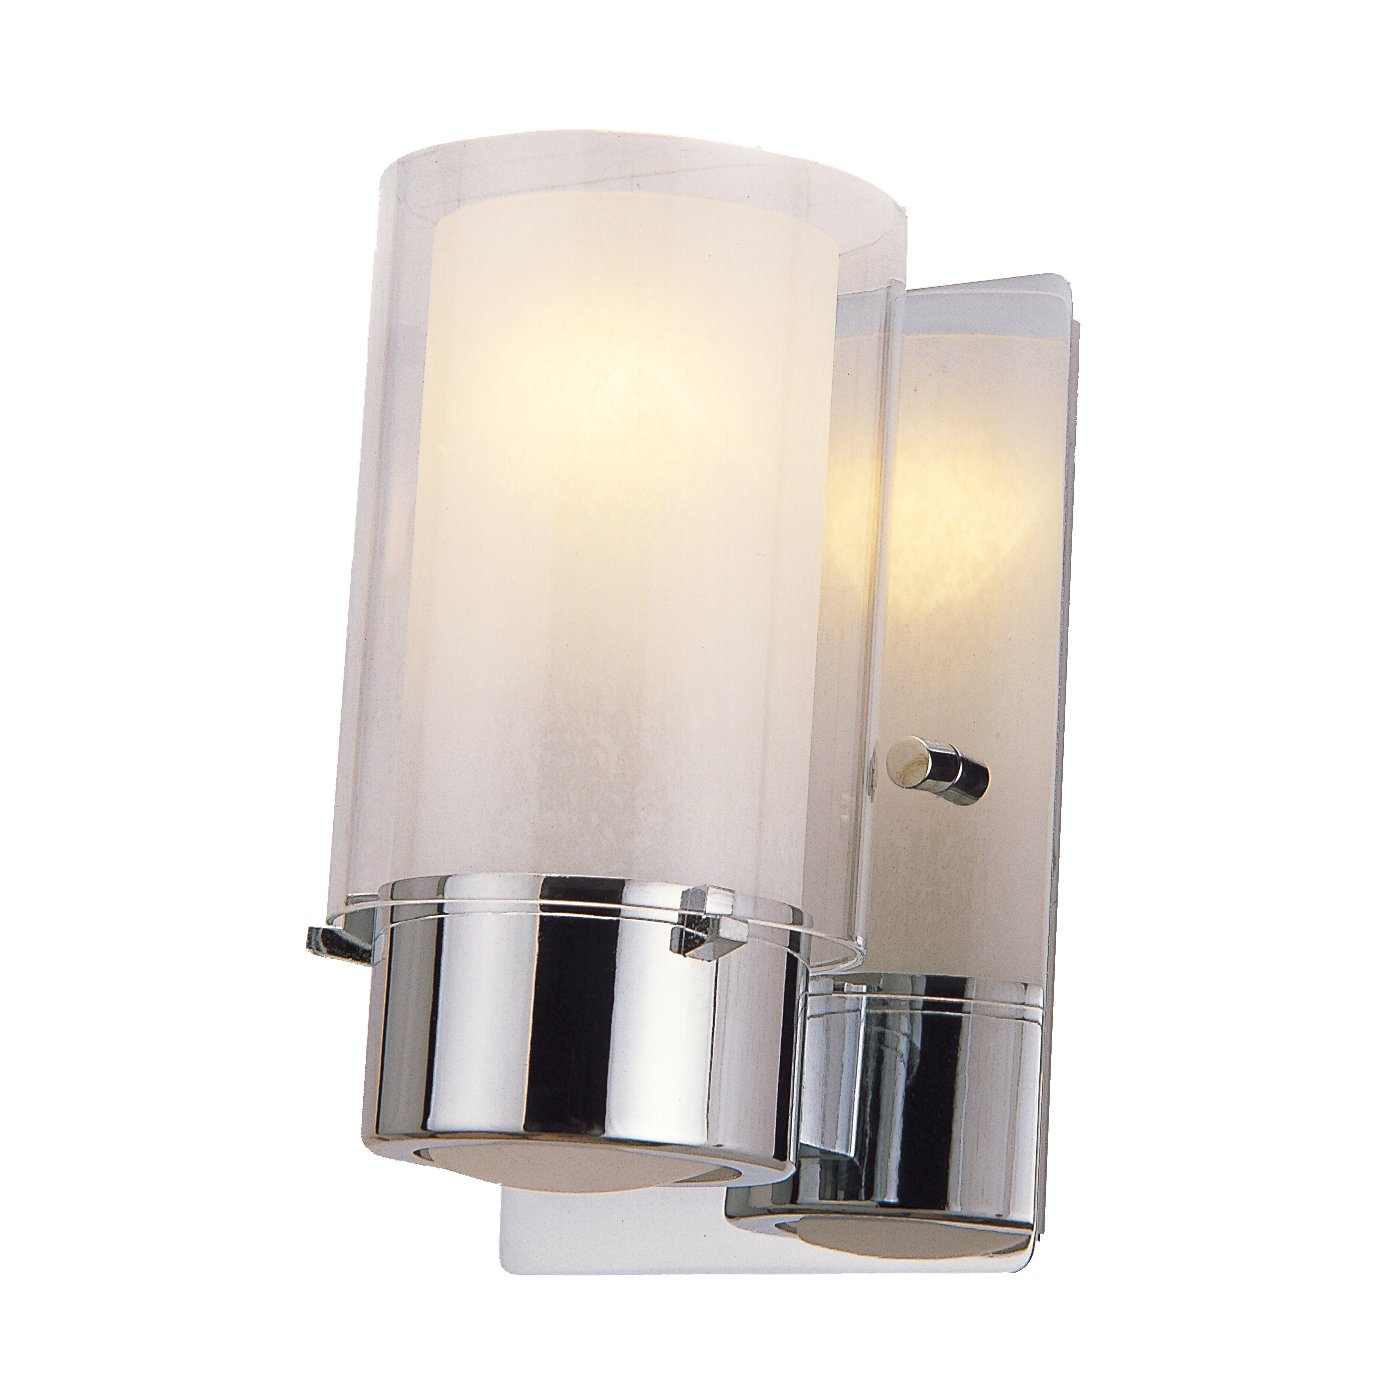 Mad for Mid-Century: Modern Bathroom Sconces on Bathroom Wall Sconce Lighting id=36772